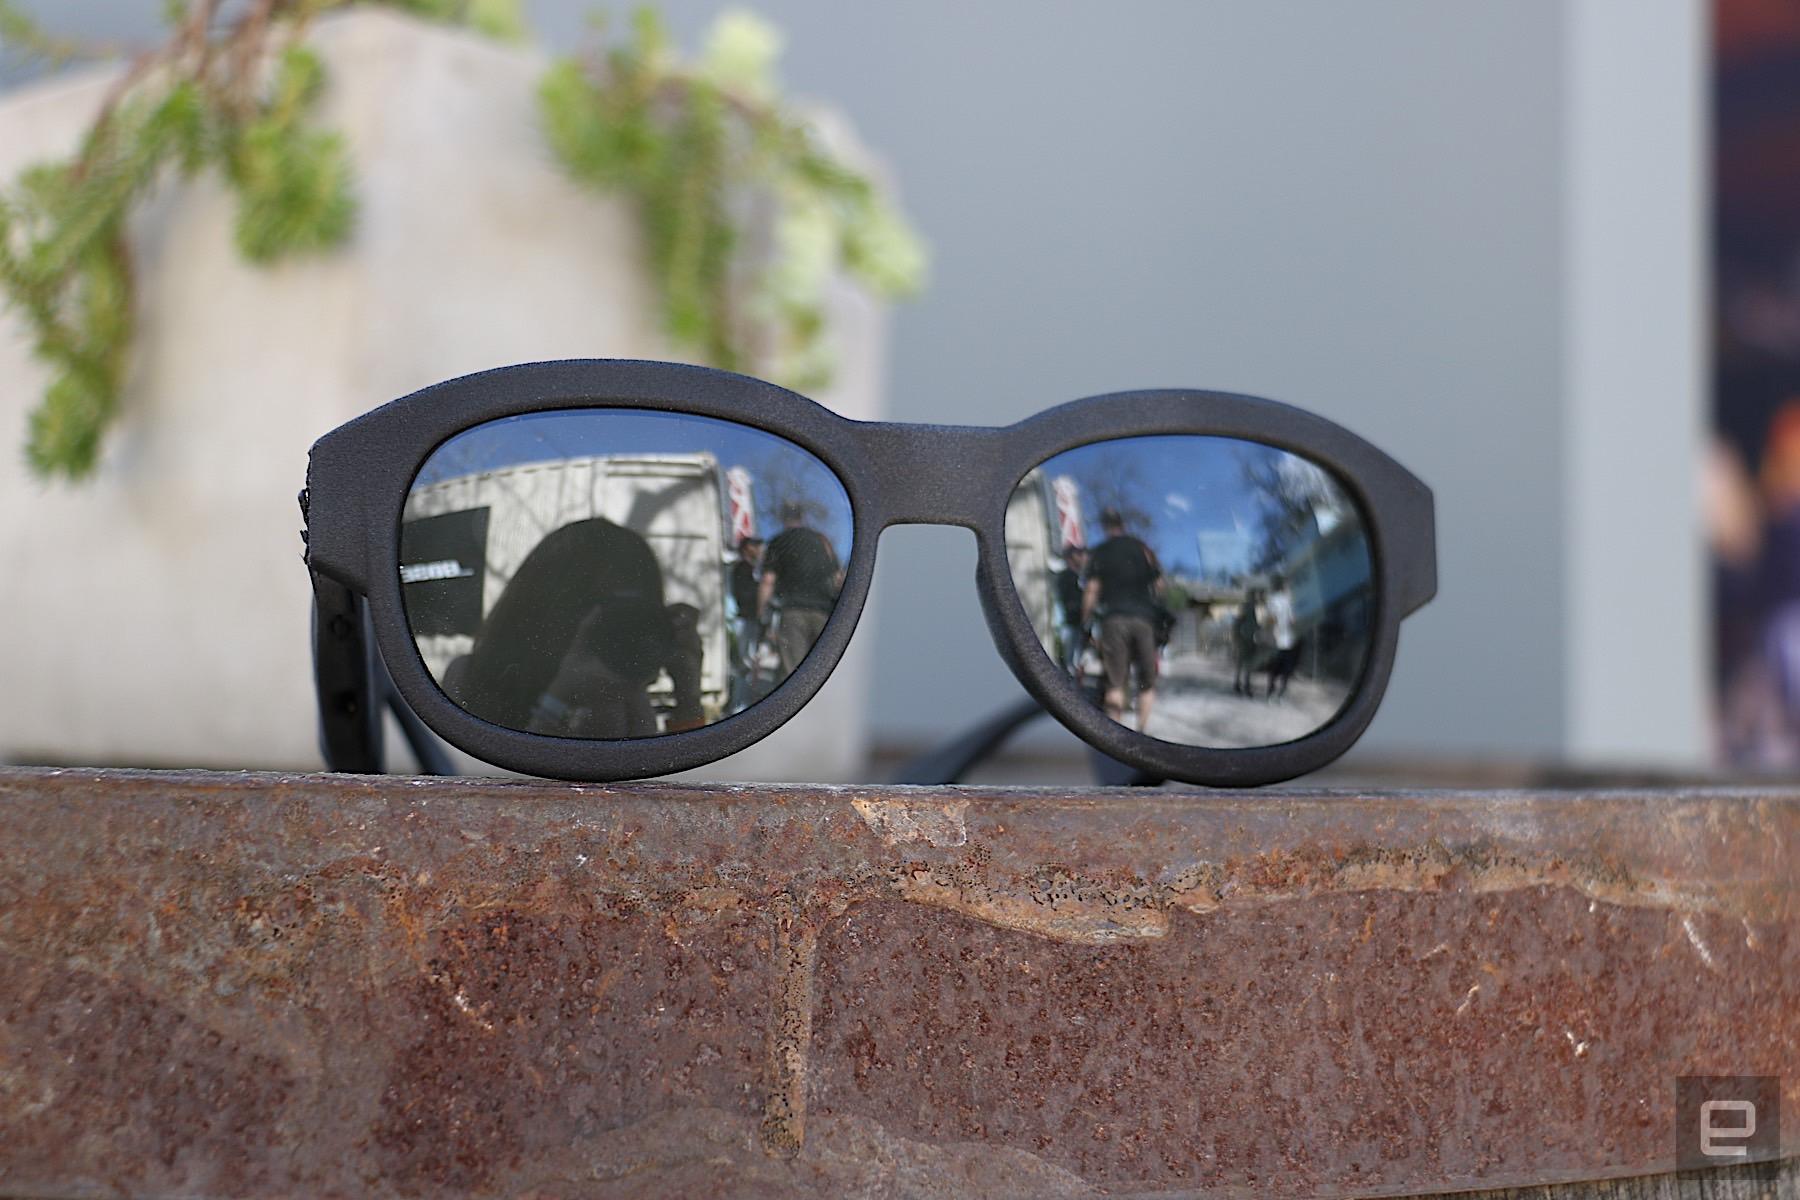 de6ff574d1 Bose sunglasses hands-on  audio AR makes more sense than you think